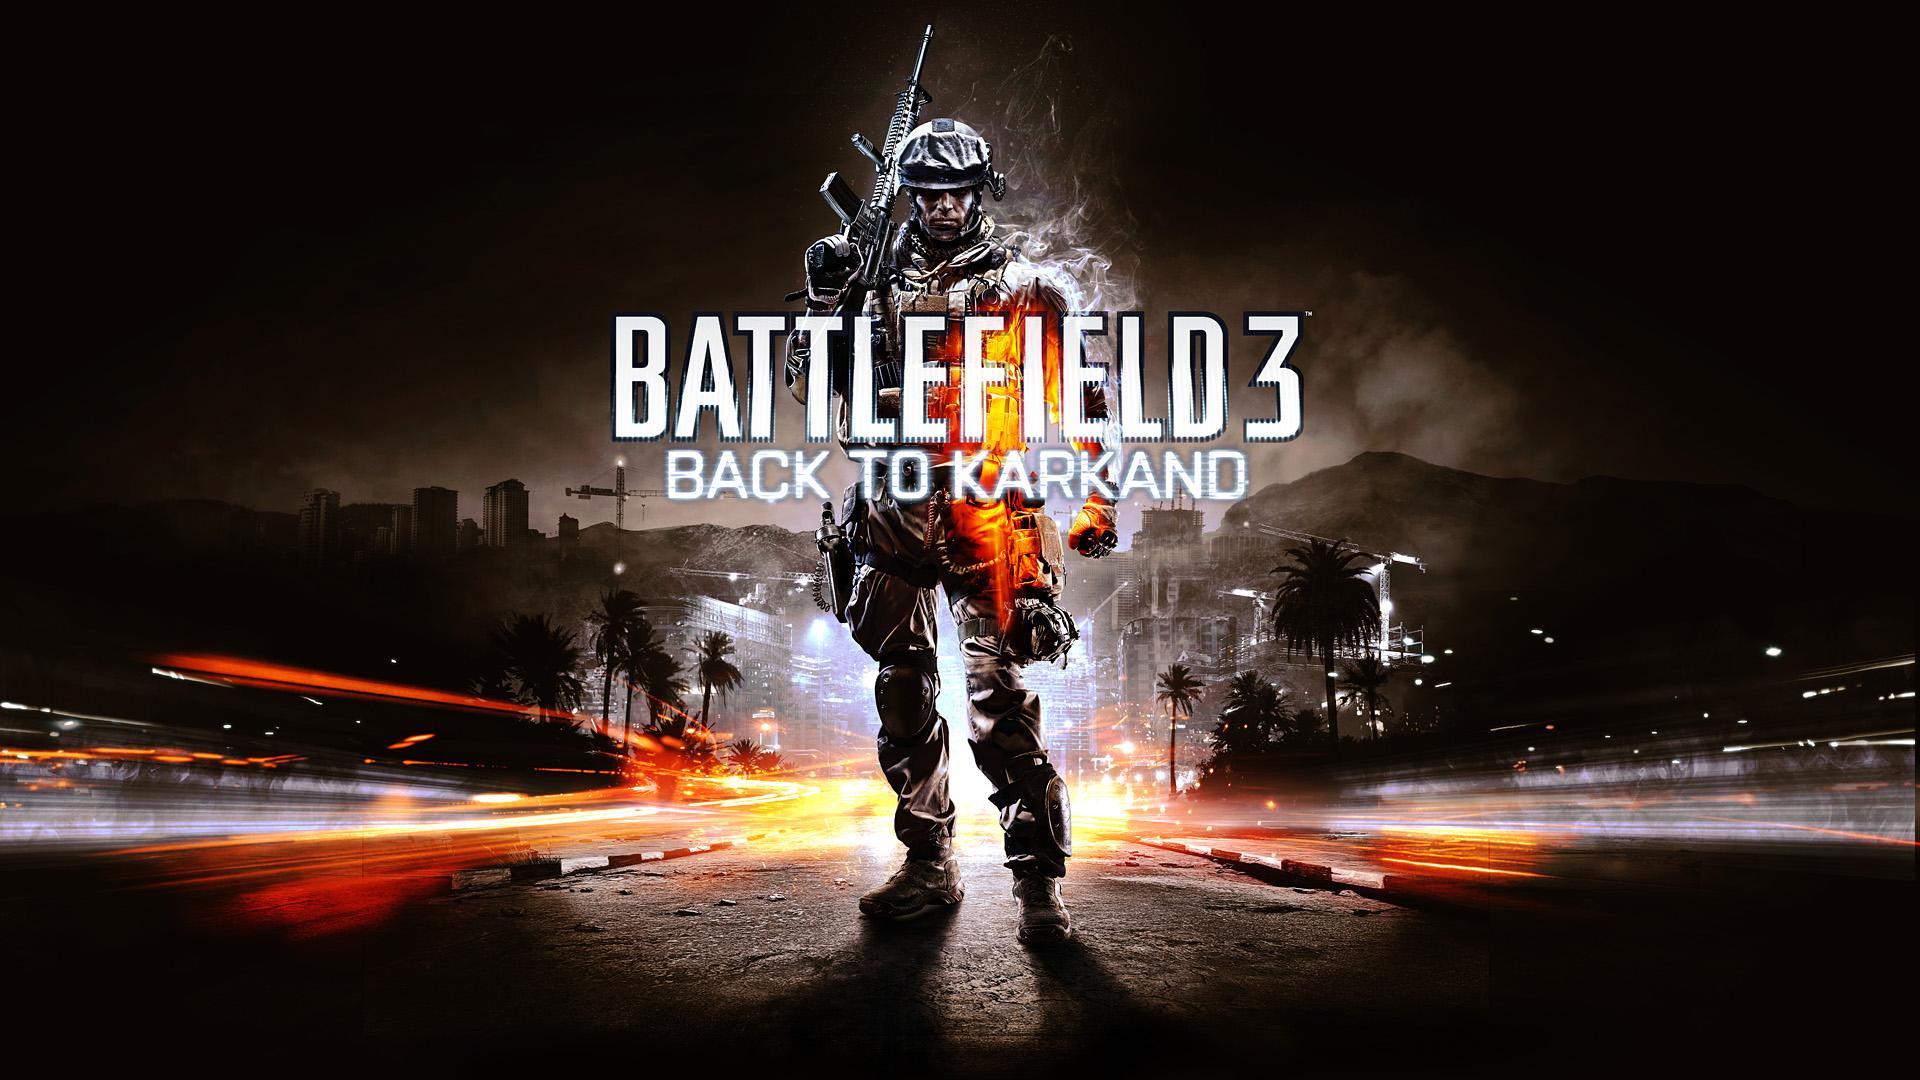 Battlefield 3 vs Call of Duty: Modern Warfare 3[recomendado]